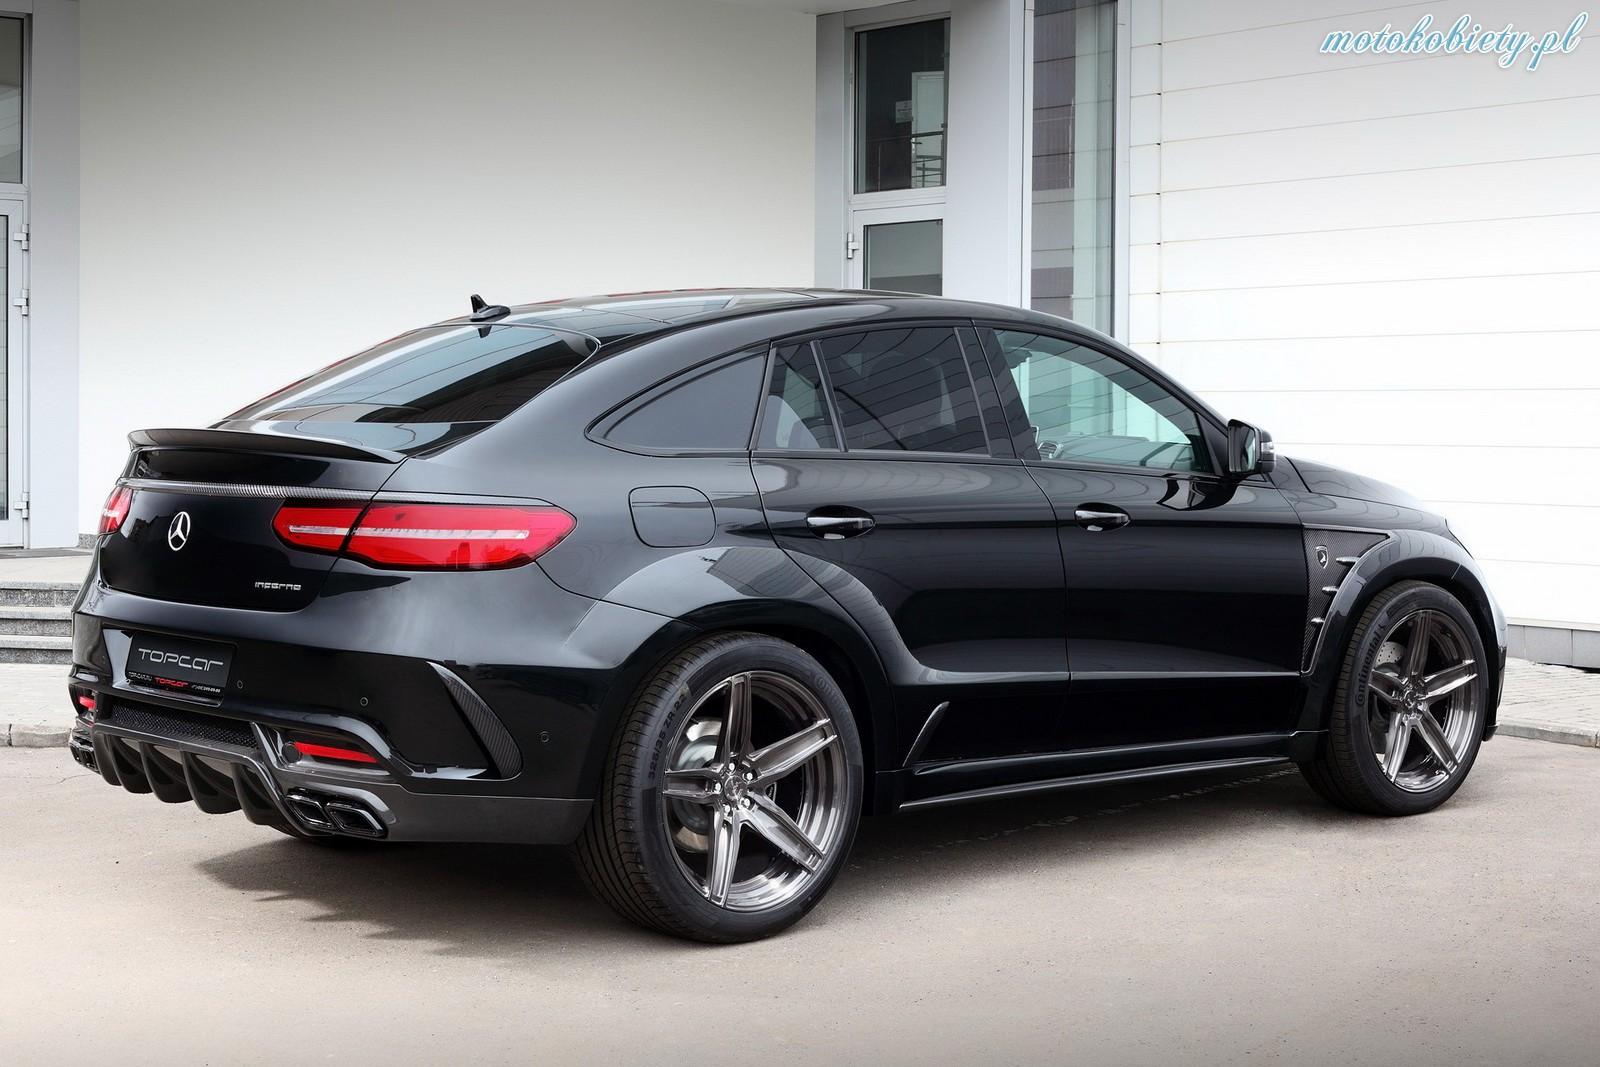 Mercedes GLE Coupe TopCar Inferno